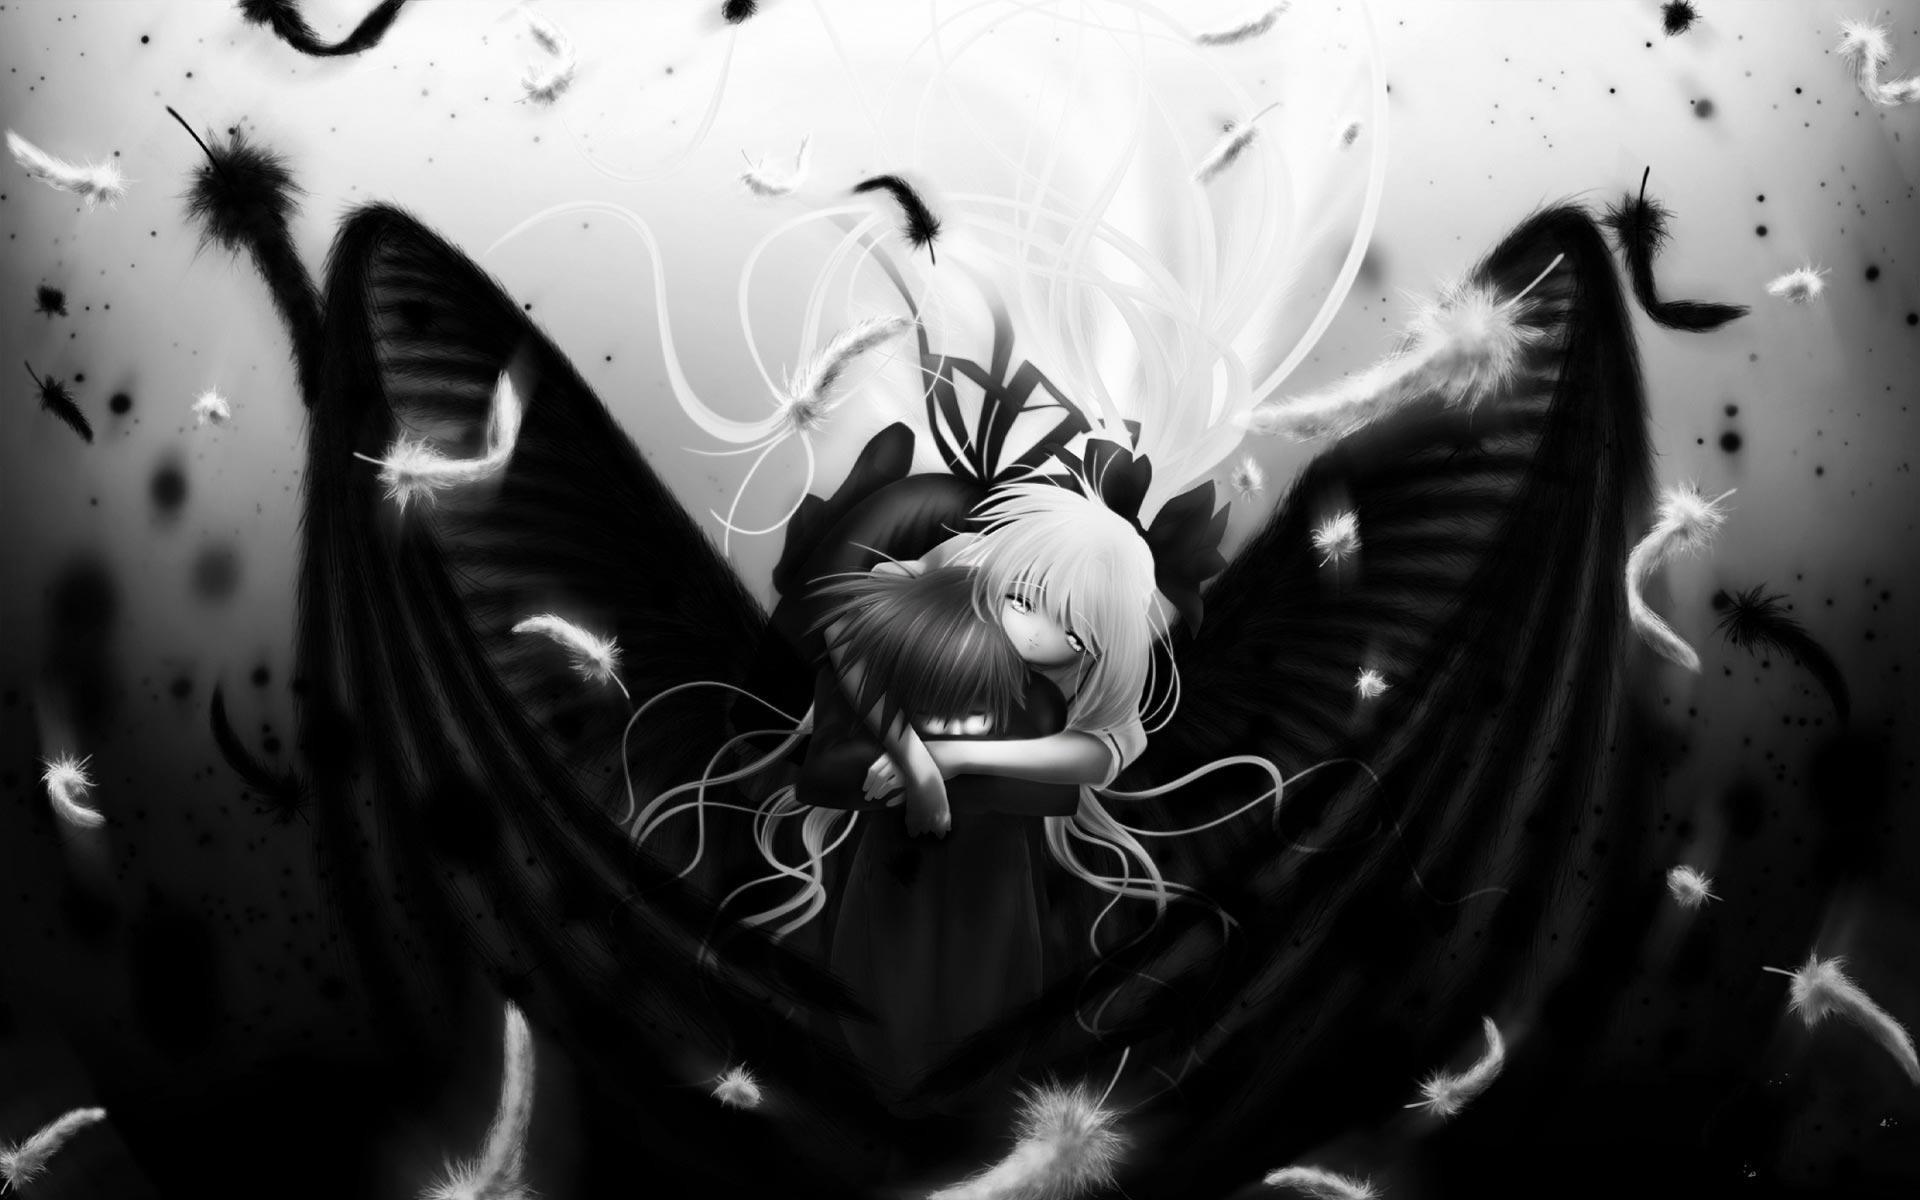 Emo Girl Hd Wallpaper Download Emo Anime Wallpaper 183 ①